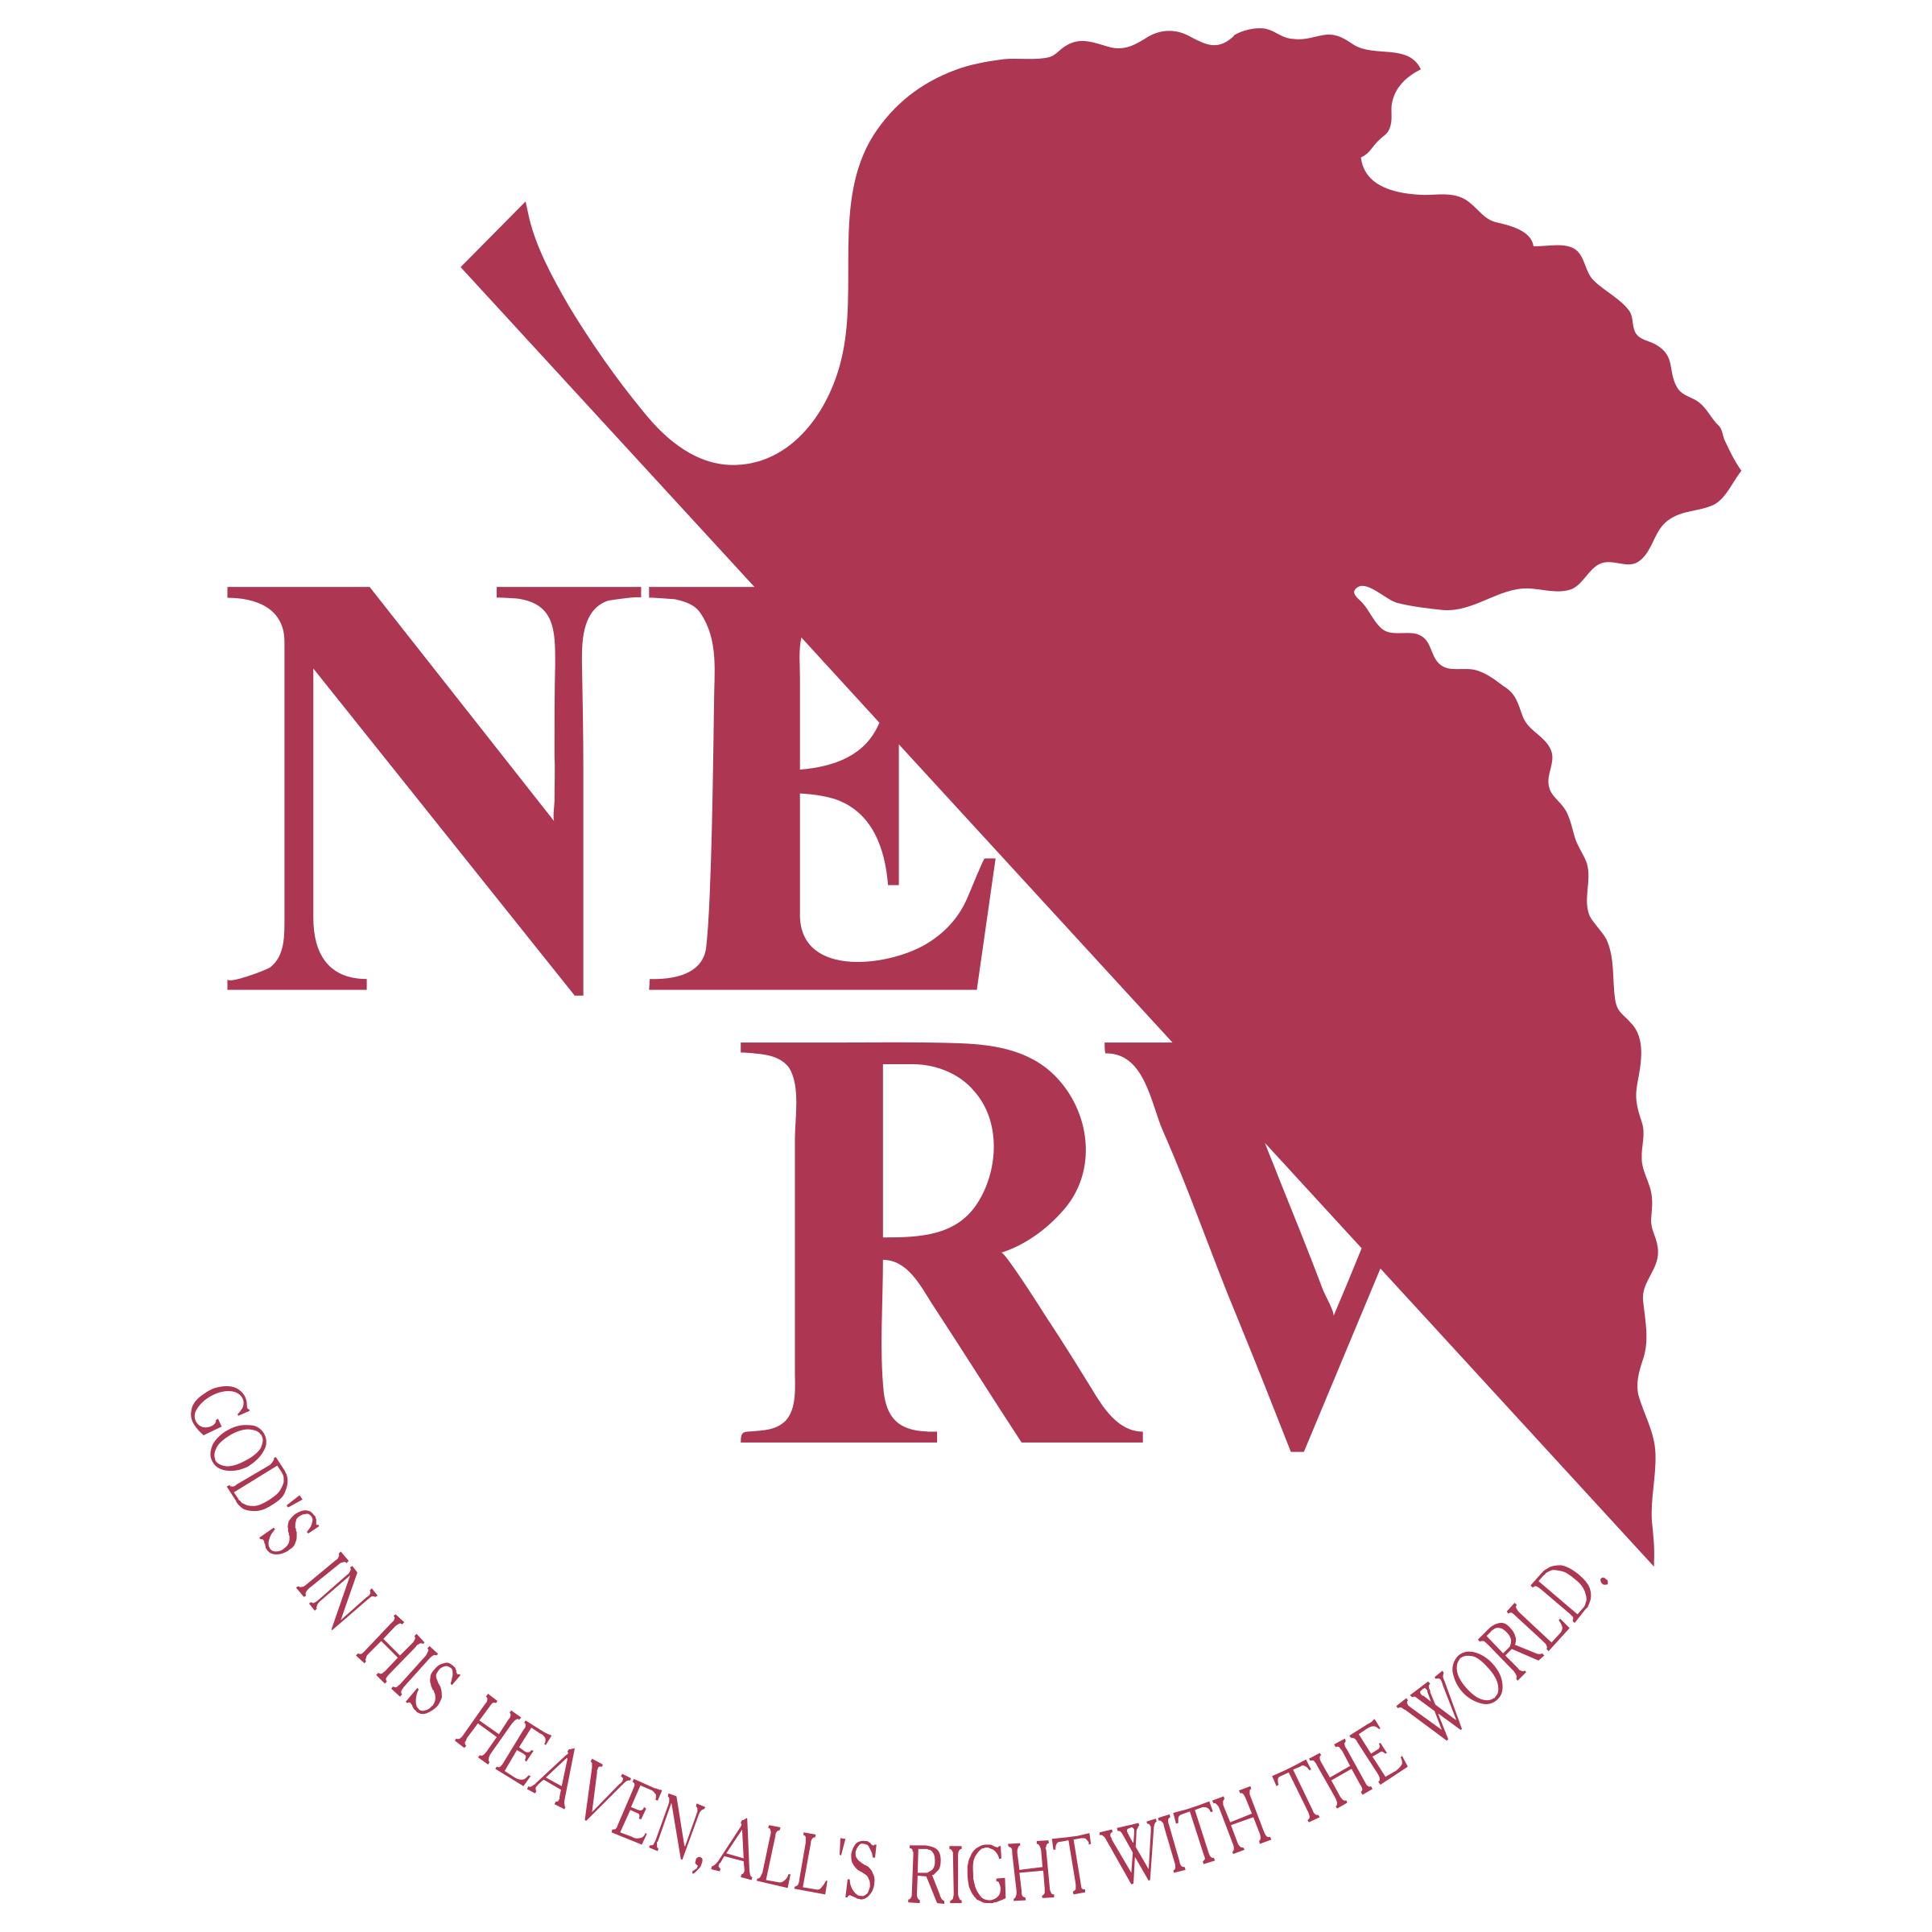 Neon Genesis Evangelion Logo PNG Transparent & SVG Vector.